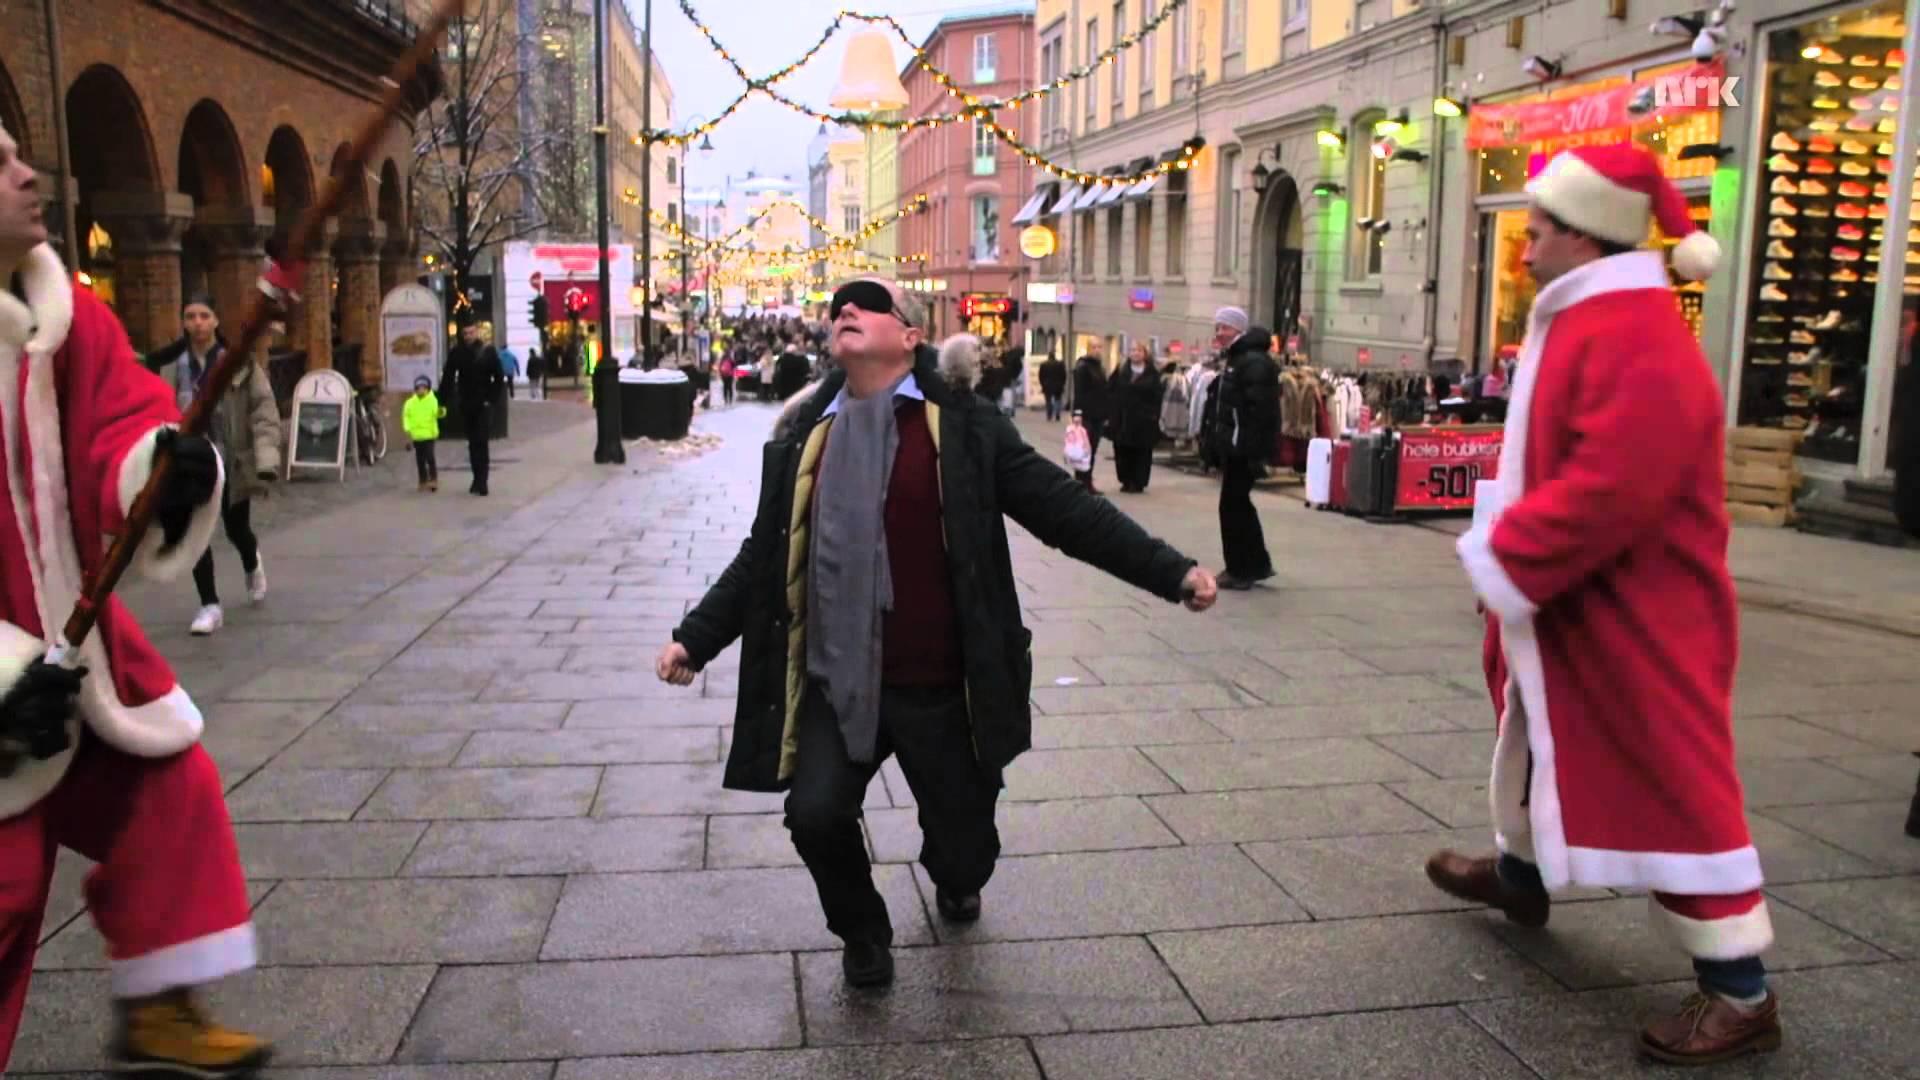 Funny Limbostick Trick in Oslo